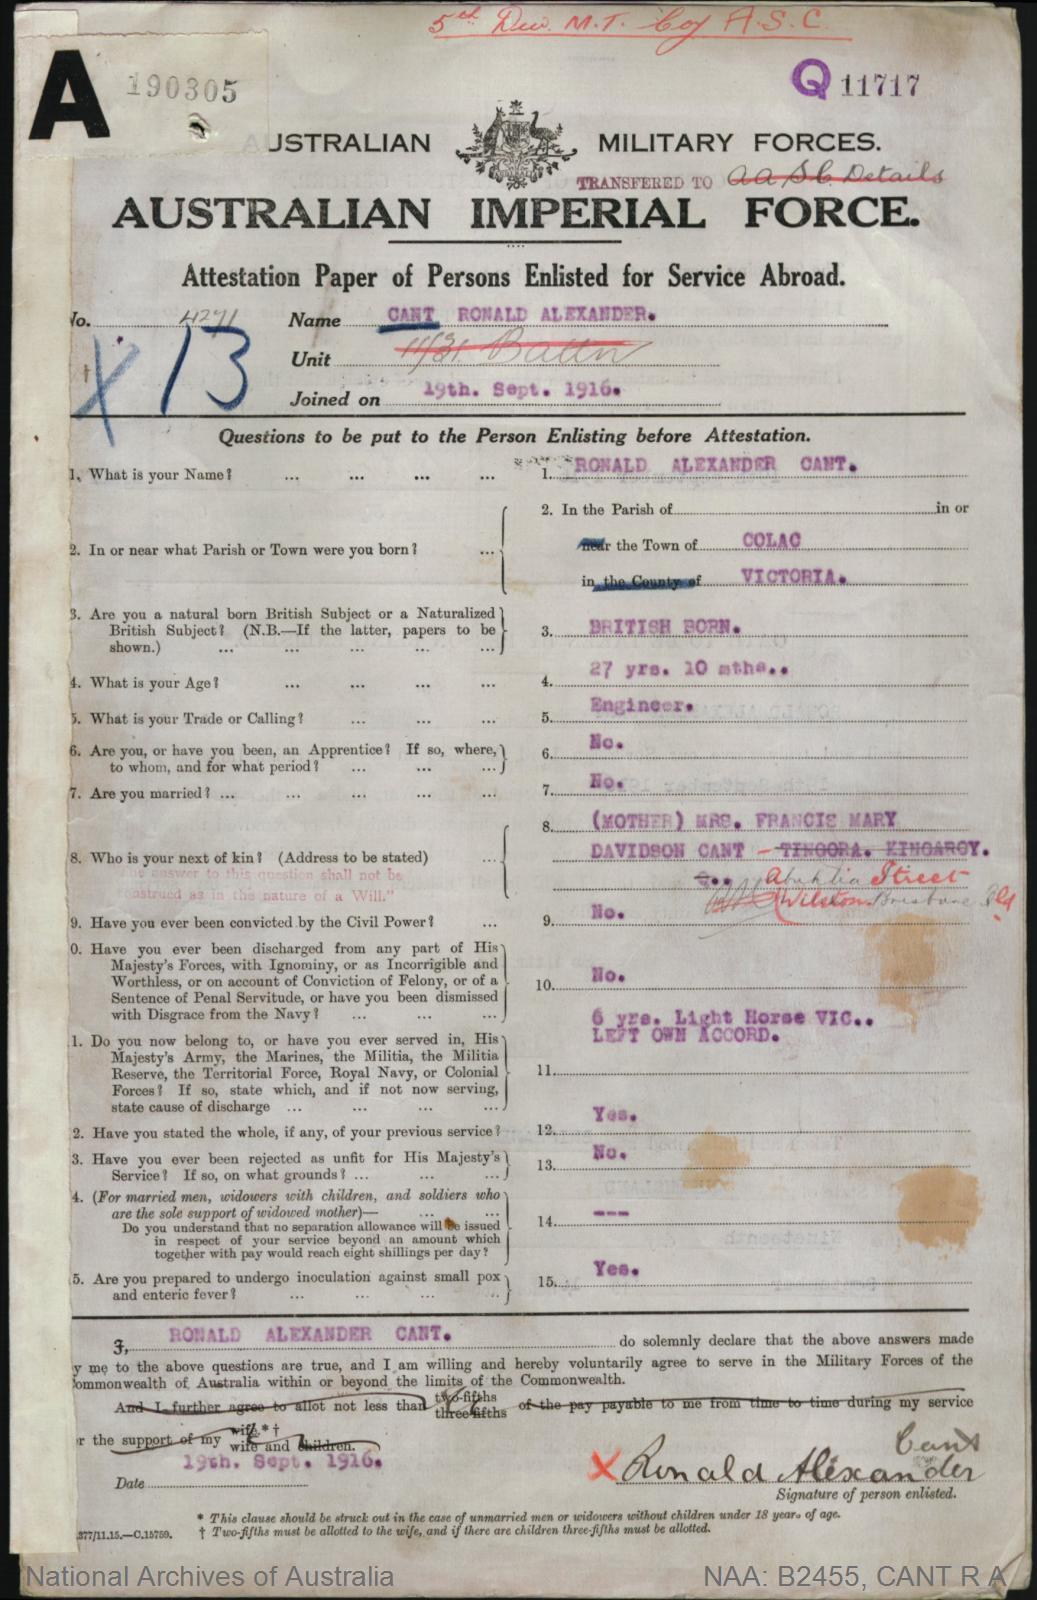 Cant Ronald Alexander : SERN 4271 : POB Colac VIC : POE Brisbane QLD : NOK M Cant Francis Mary Davidson